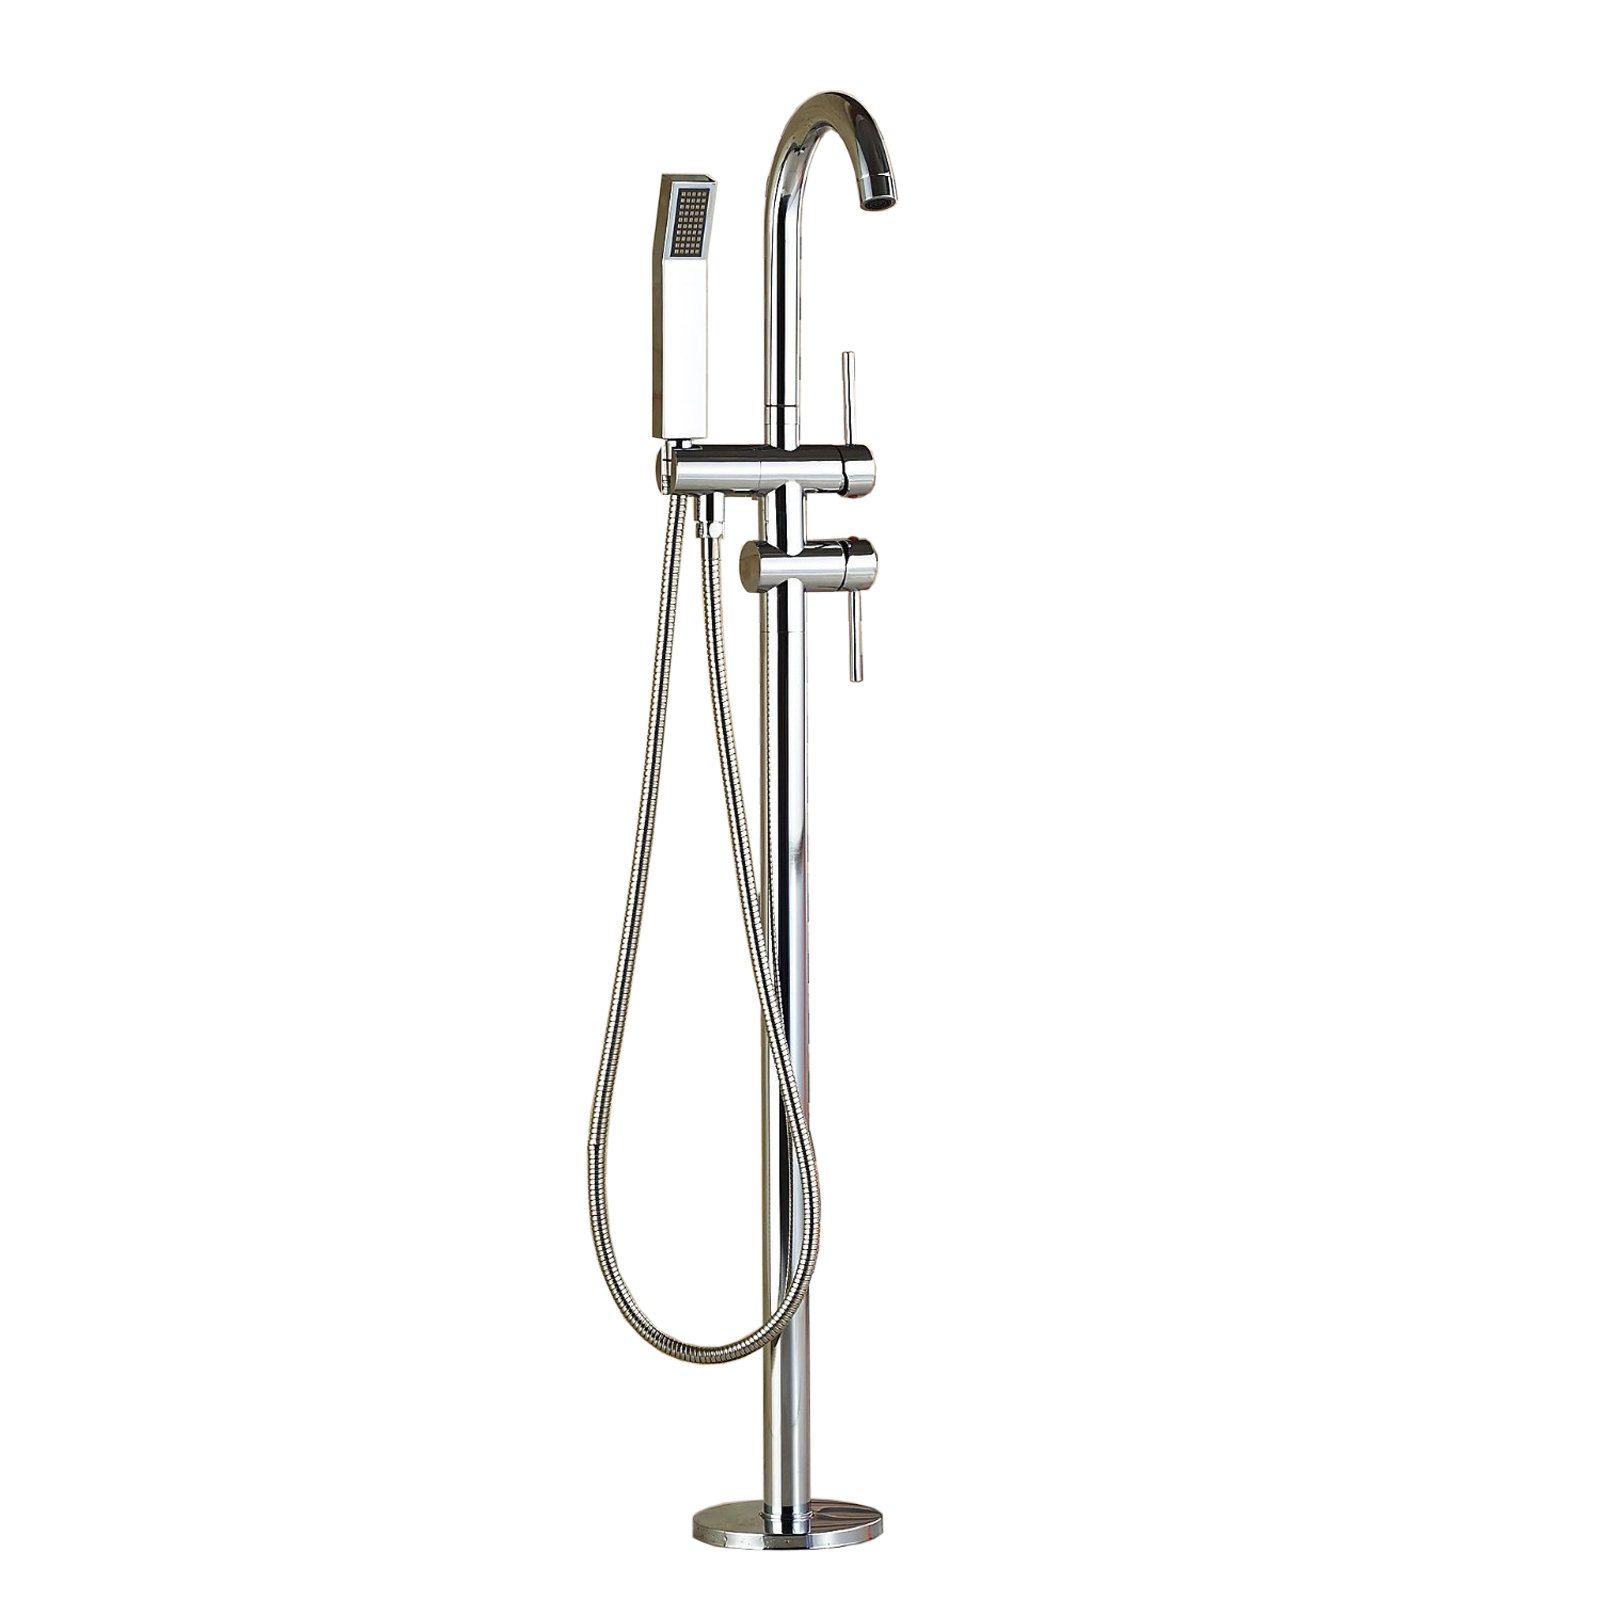 Votamuta Polished Chrome Brass Bathroom Floor Mount Bathtub Faucet with ABS Plastic Handshower Free Standing Tub Filler Tap